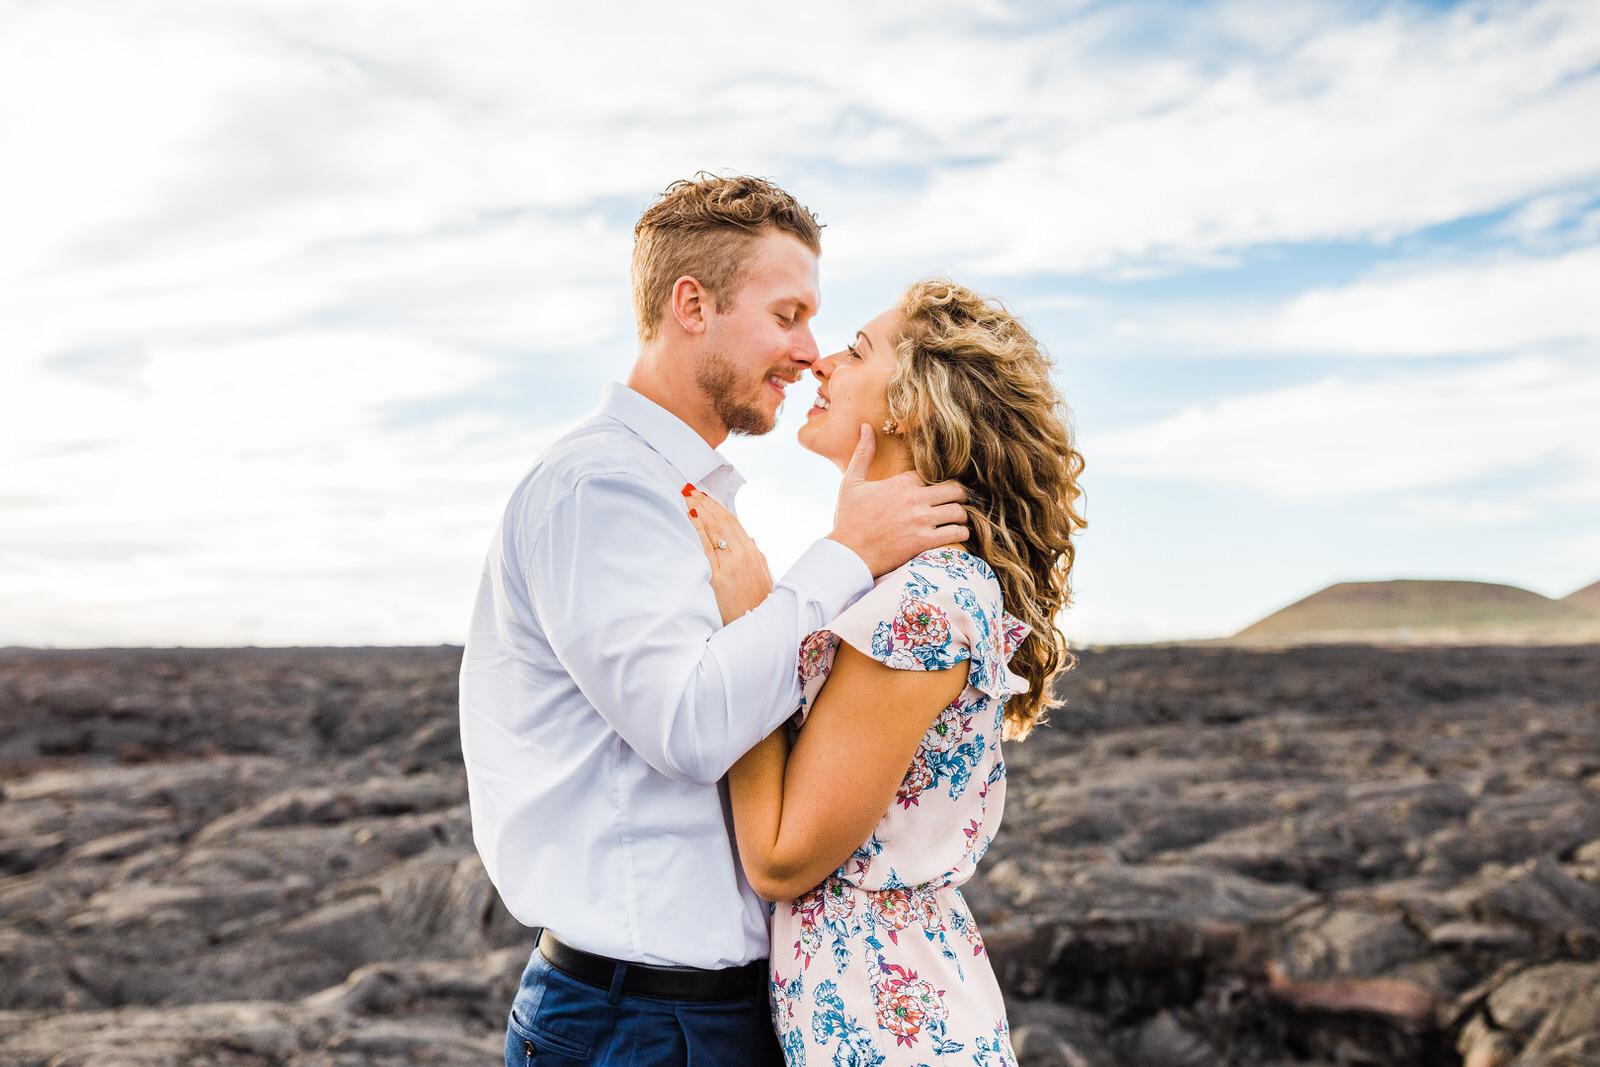 engagements-hilo-happy-couple-big-island-hawaii-5.jpg